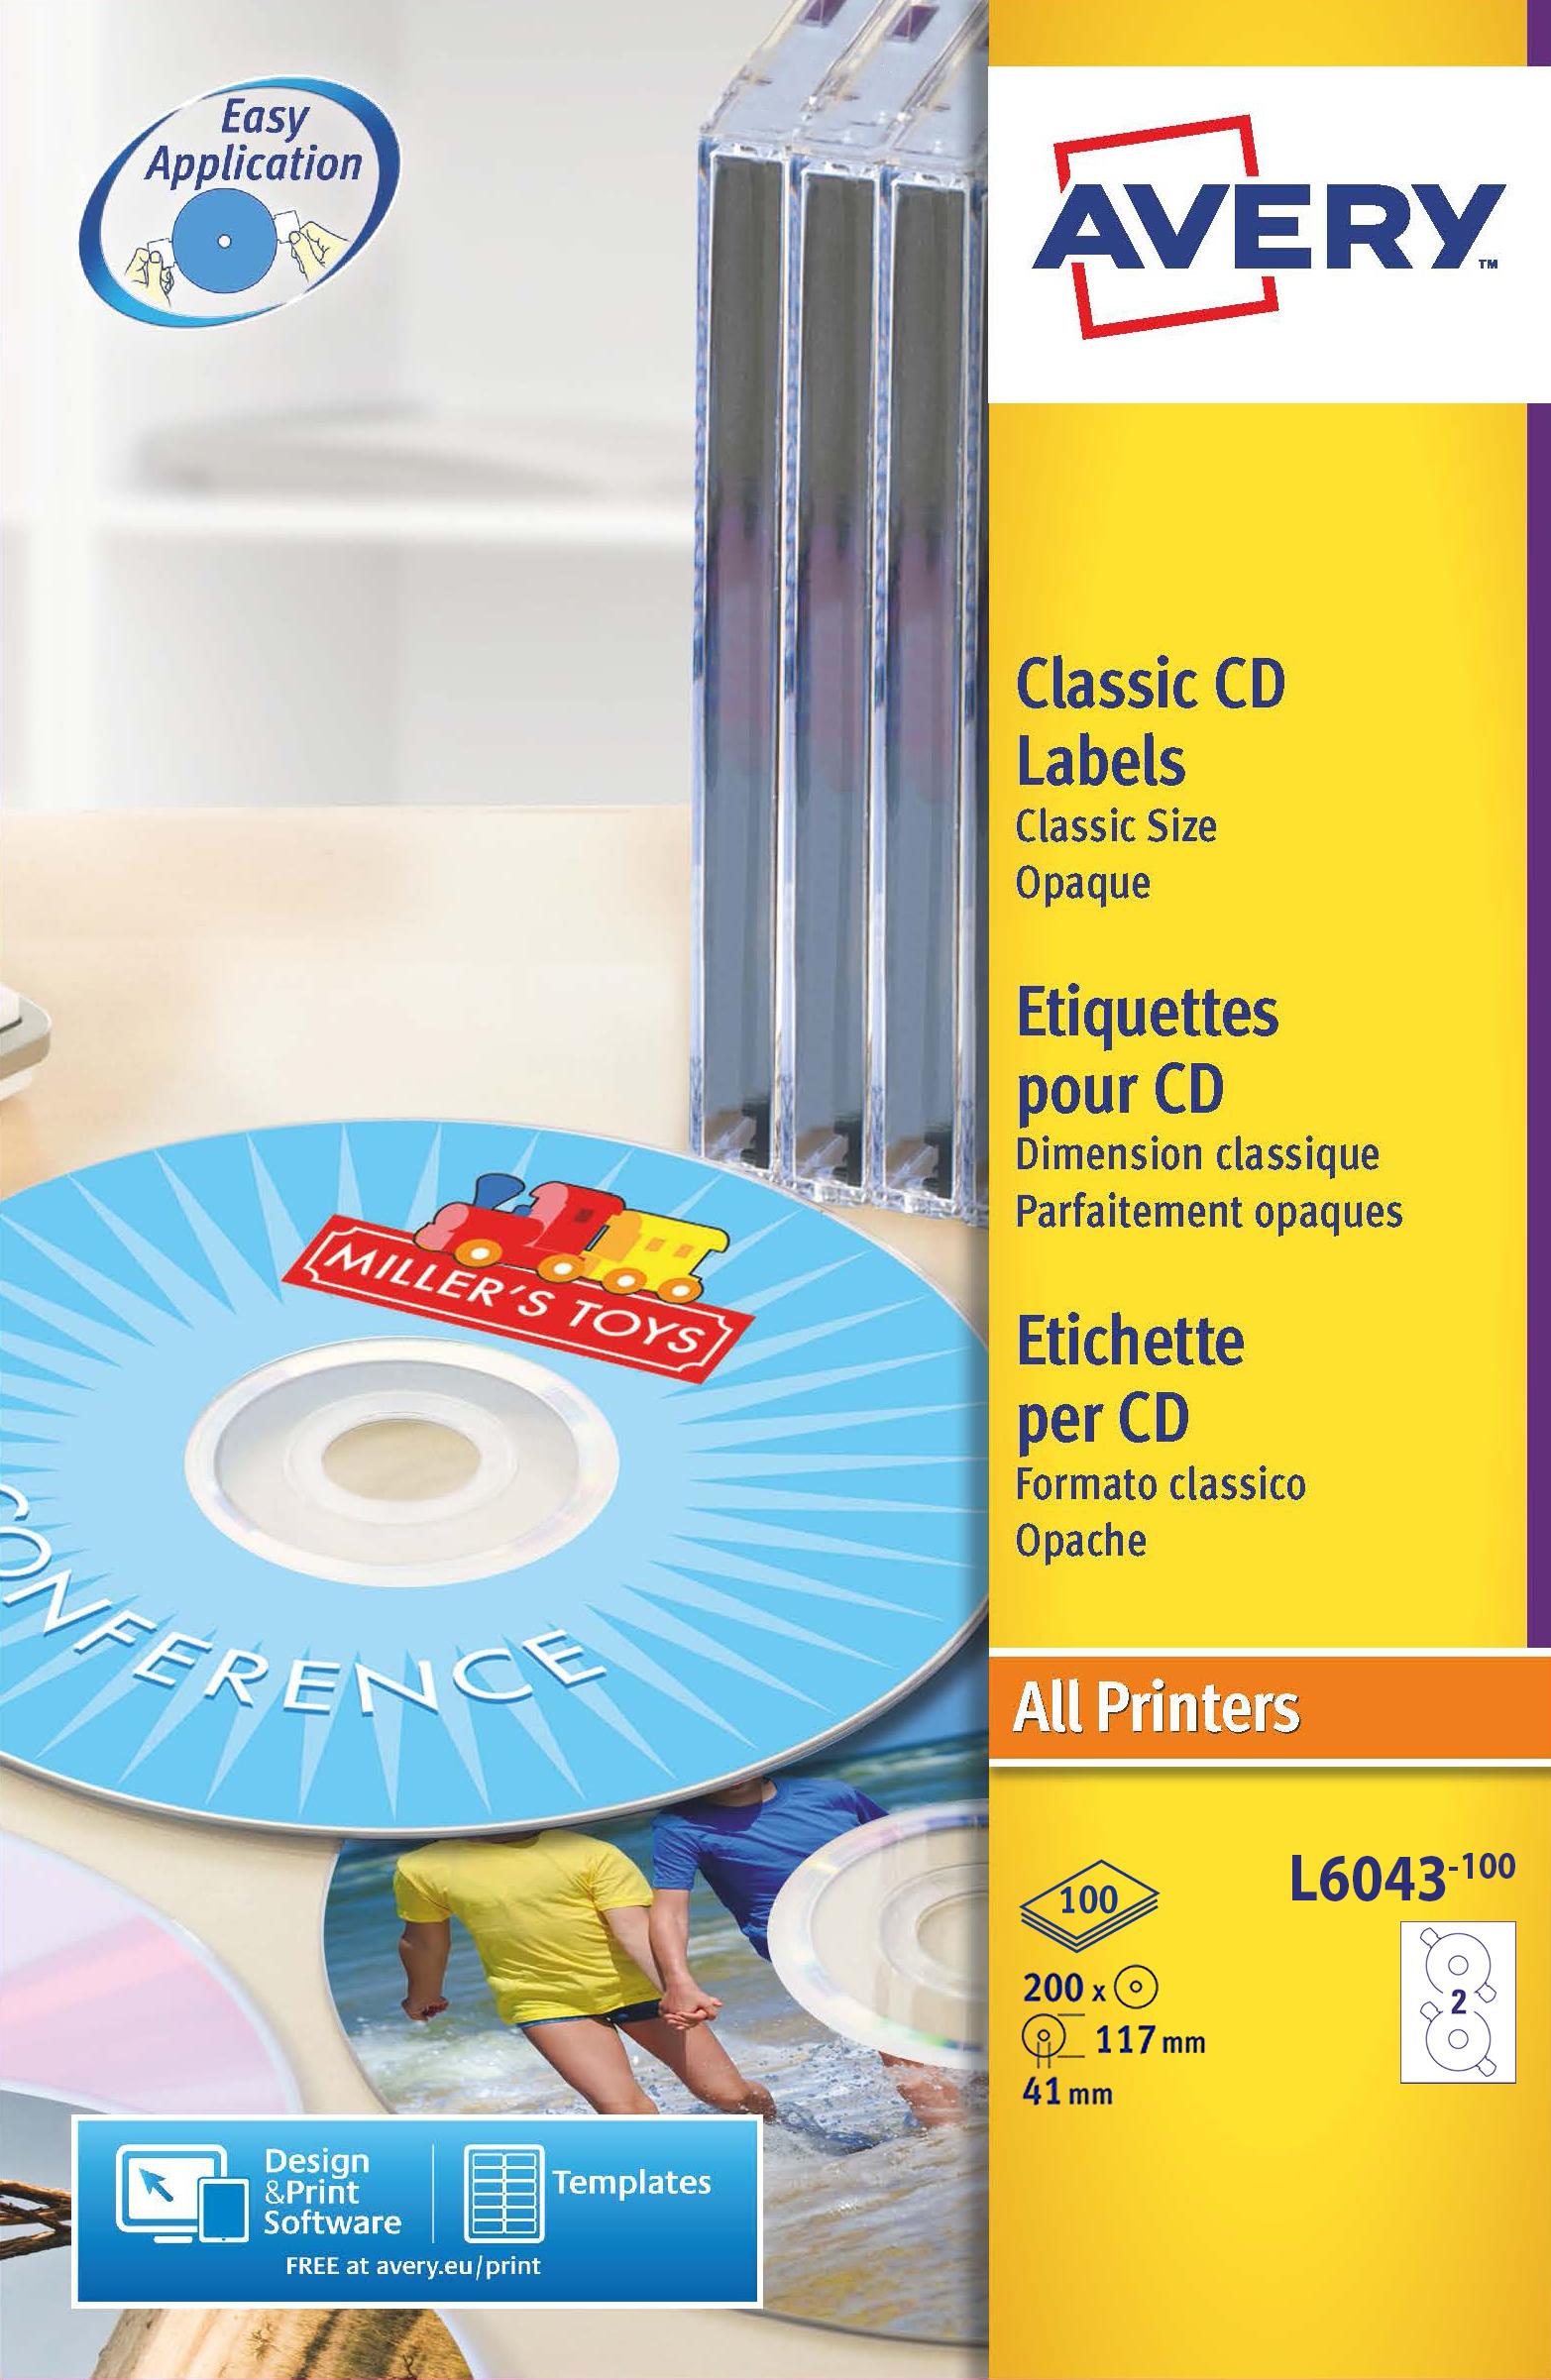 Avery Classic CD Label 117mm Dia PK200